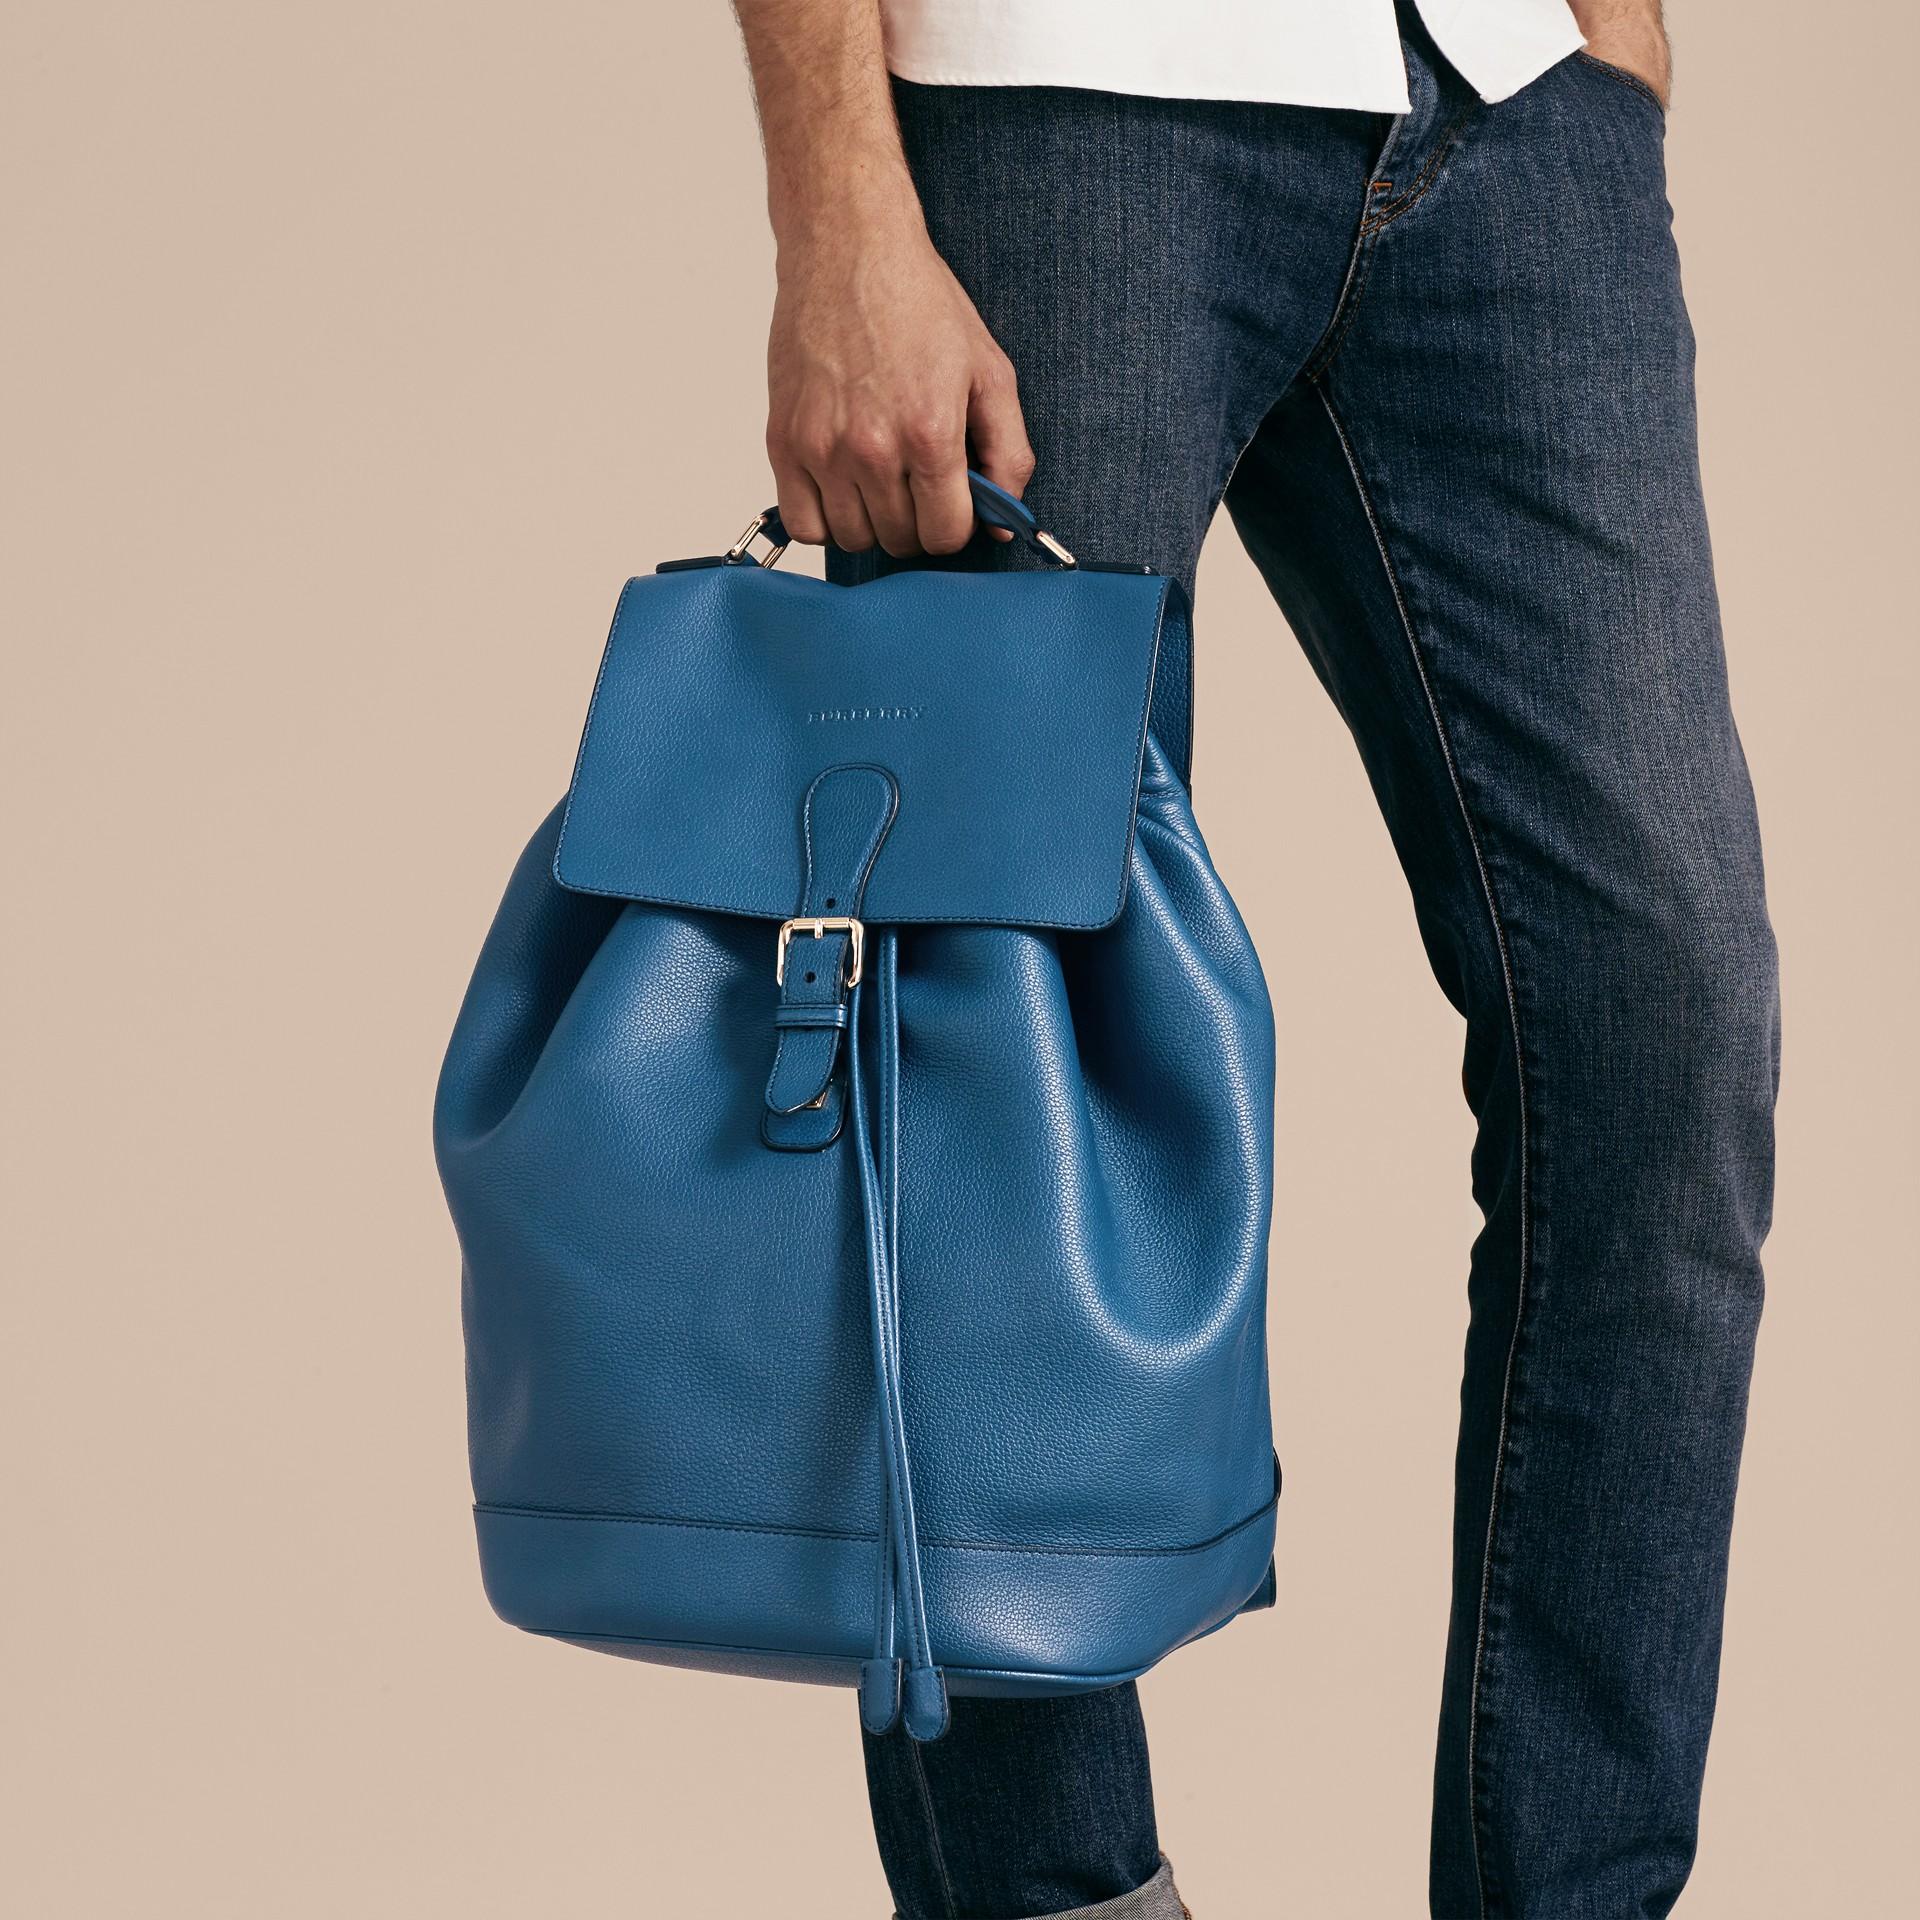 Mineralblau Rucksack aus genarbtem Leder Mineralblau - Galerie-Bild 4